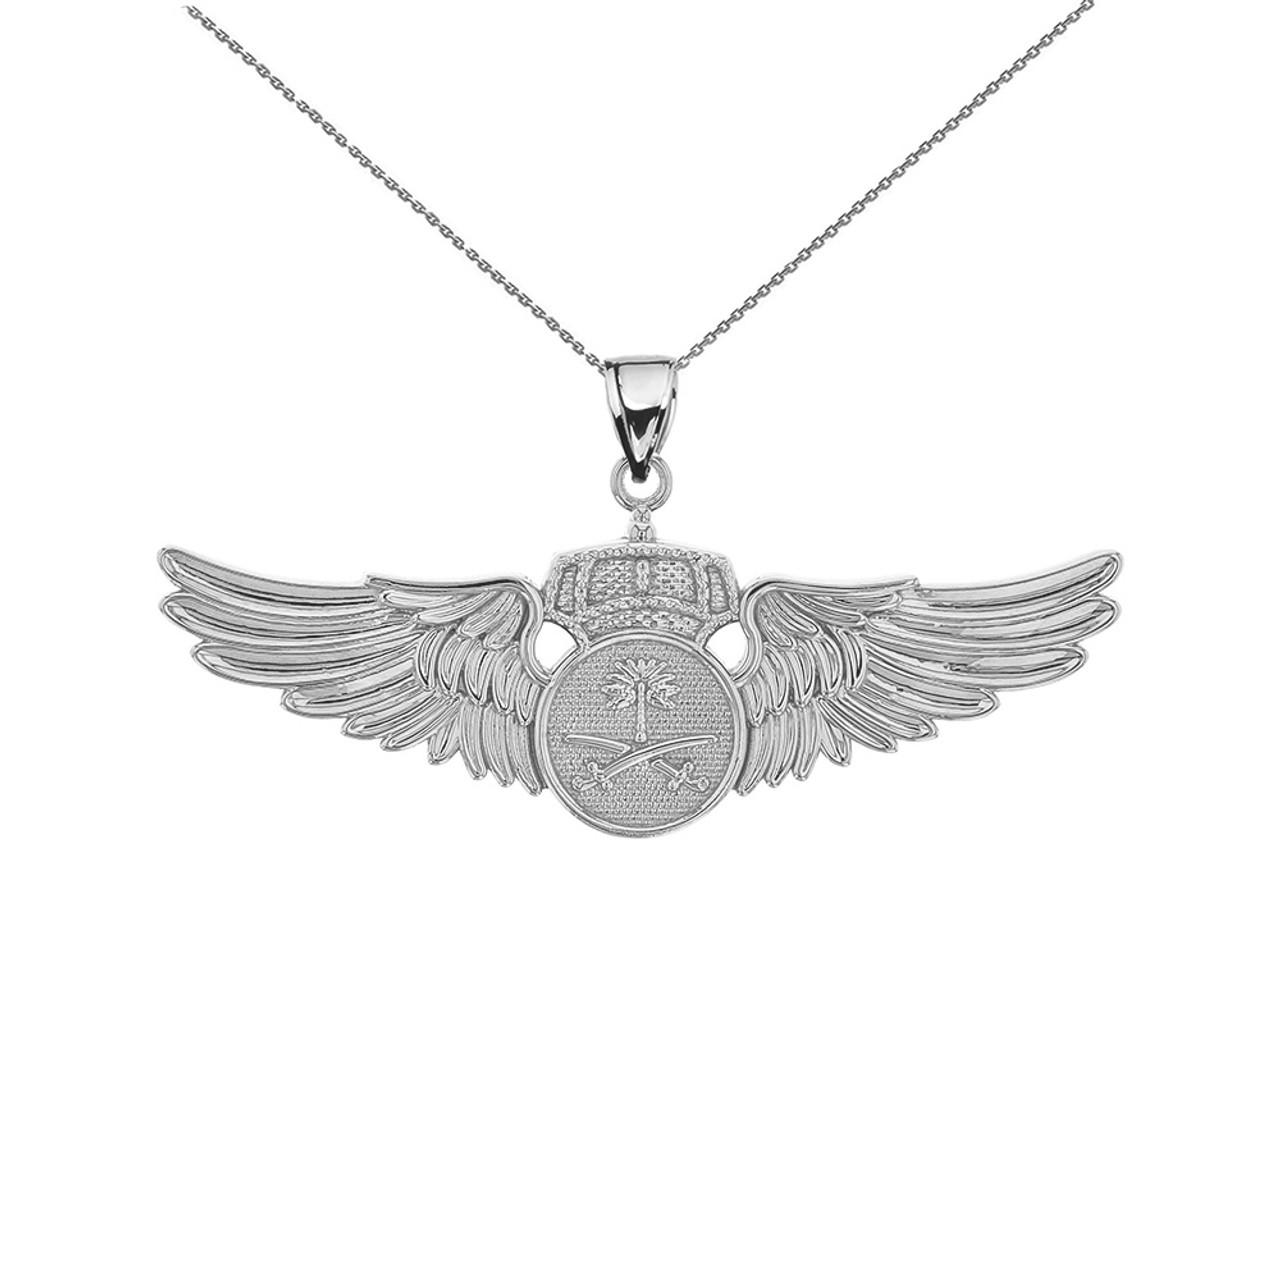 White gold saudi arabian air force wings pendant necklace aloadofball Choice Image